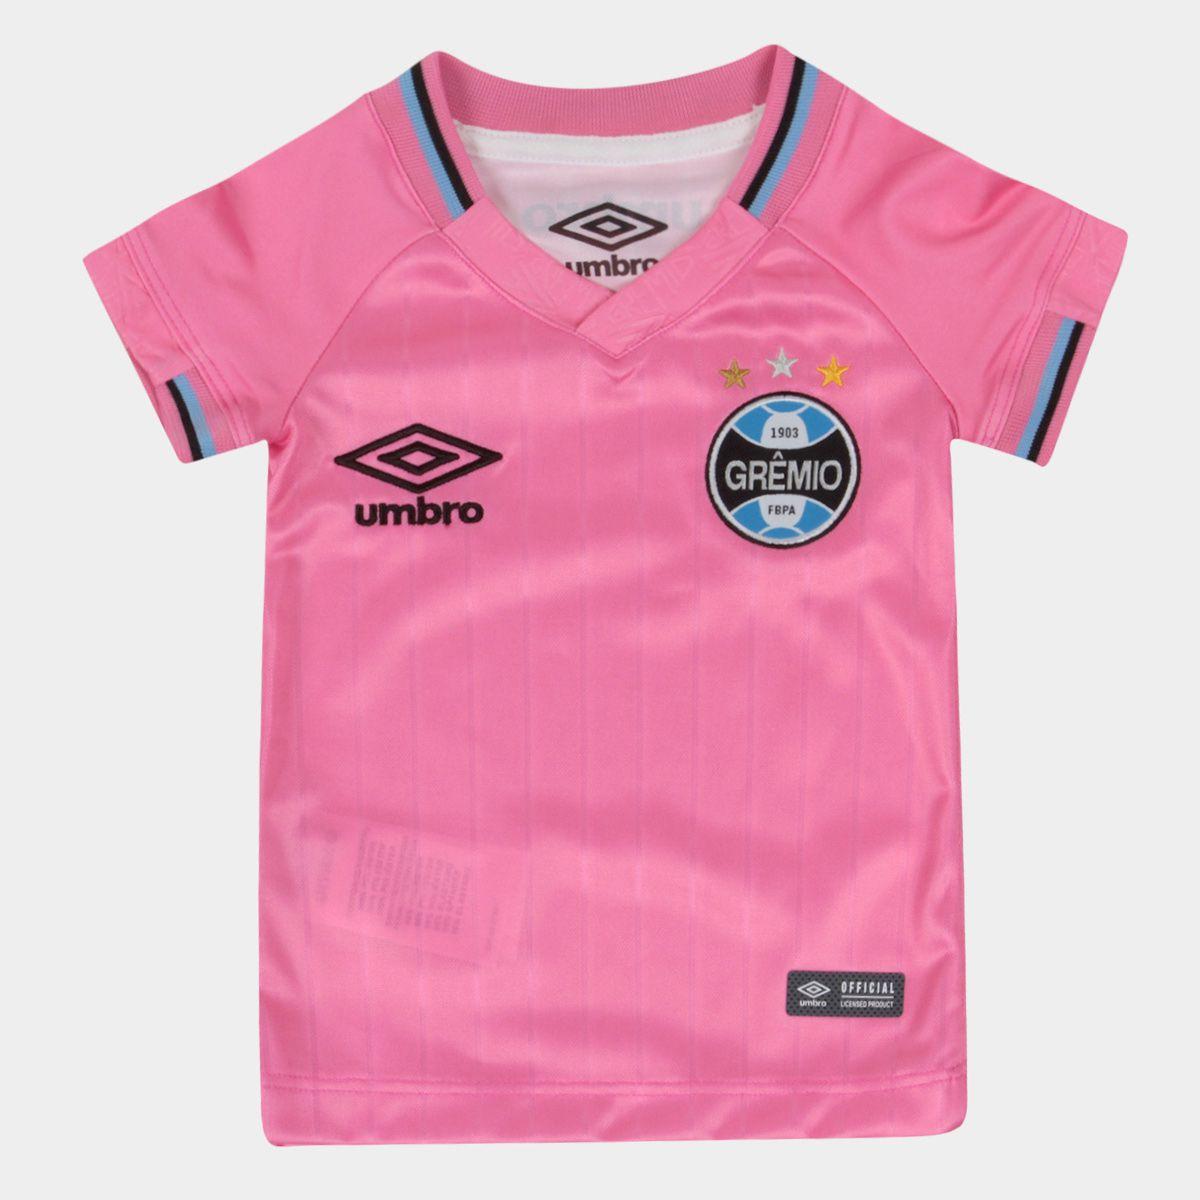 Camiseta Umbro Grêmio Outubro Rosa 2018 Feminina INFANTIL